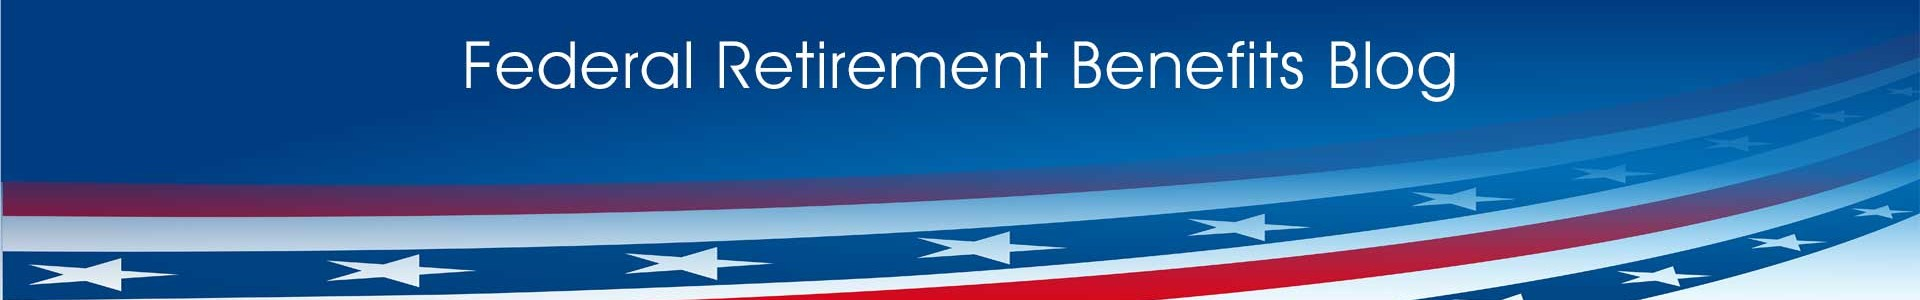 Blog Retirement Benefits Institute